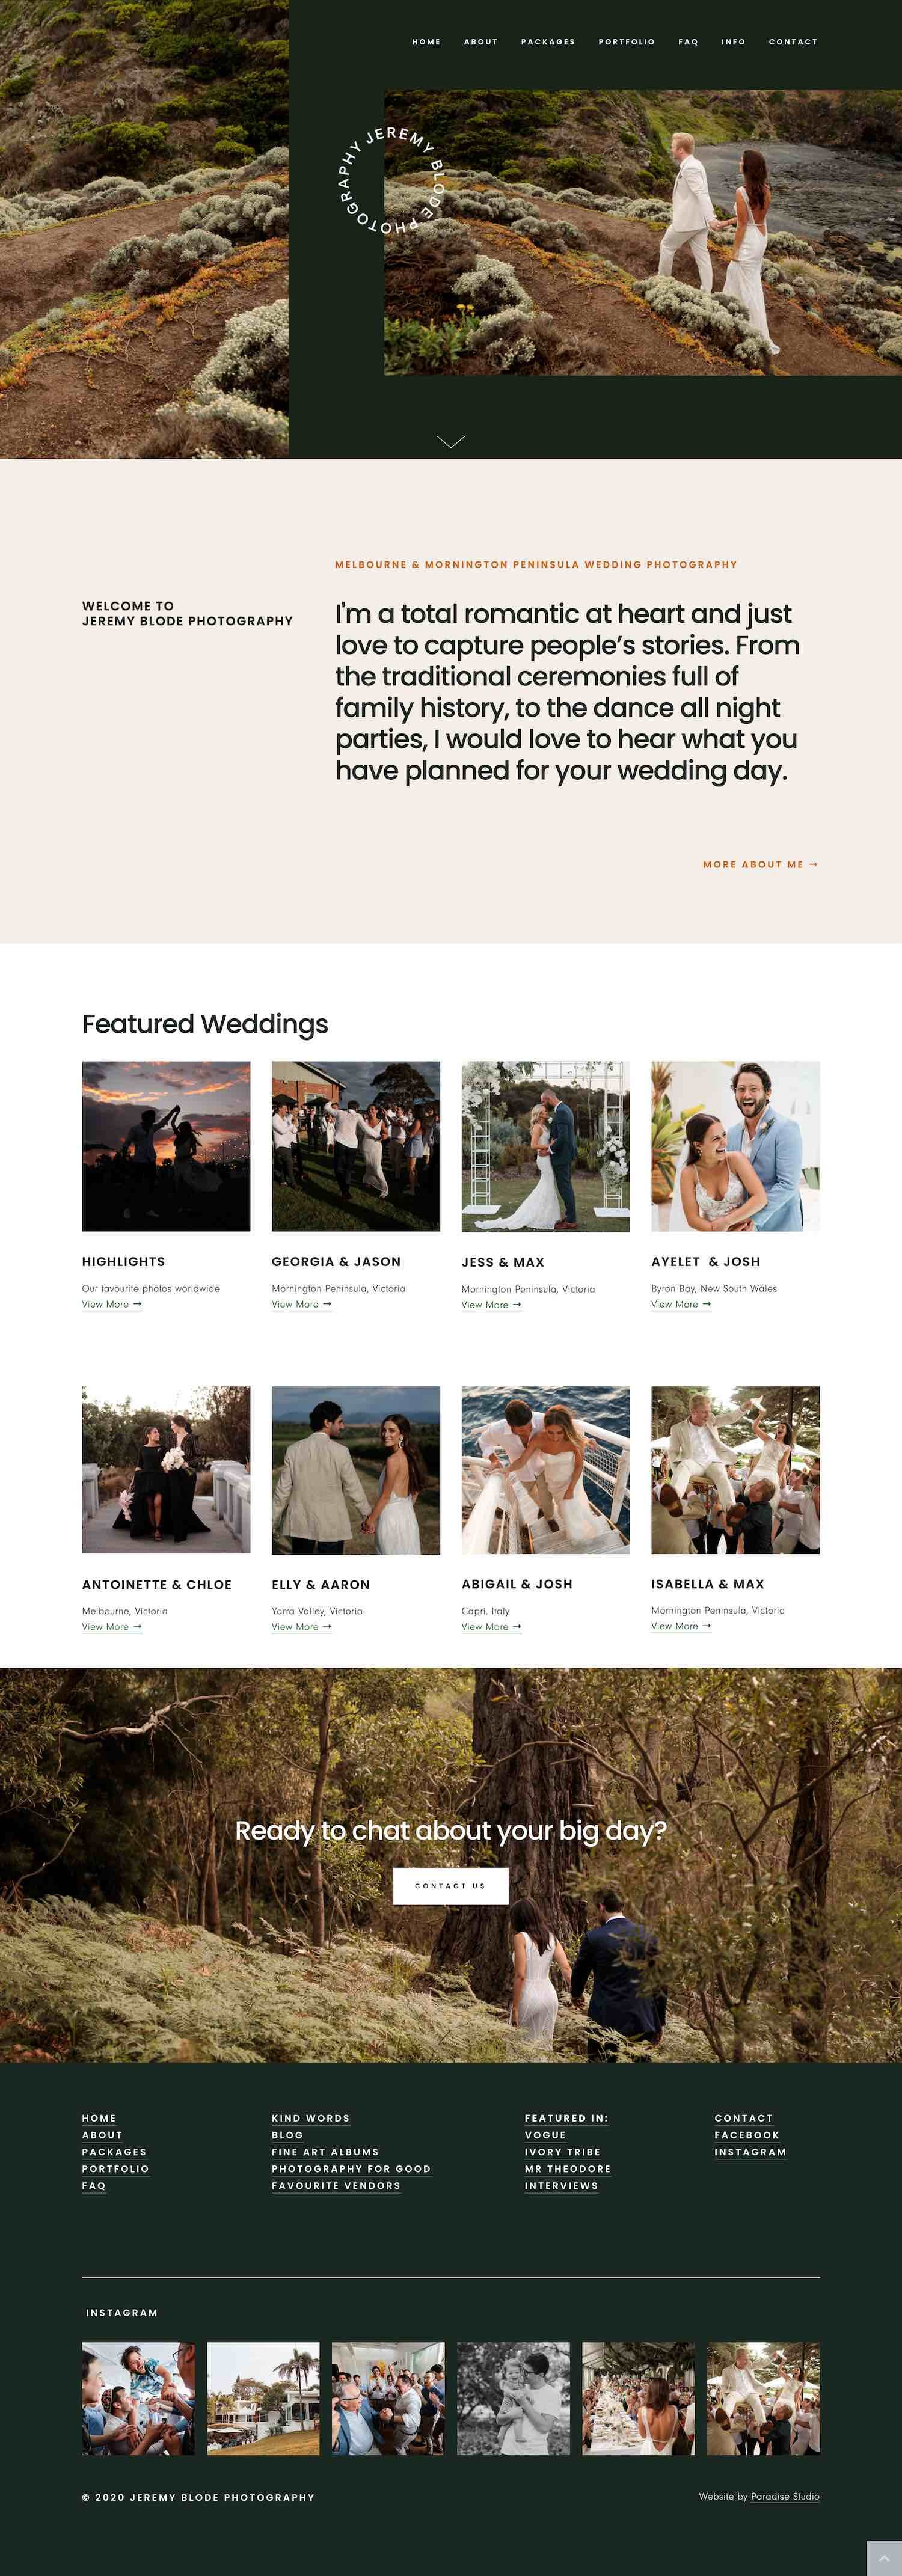 20 Best Example Squarespace Websites Photographer Edition Paige Brunton Squarespace Templates Squarespace Designer Courses